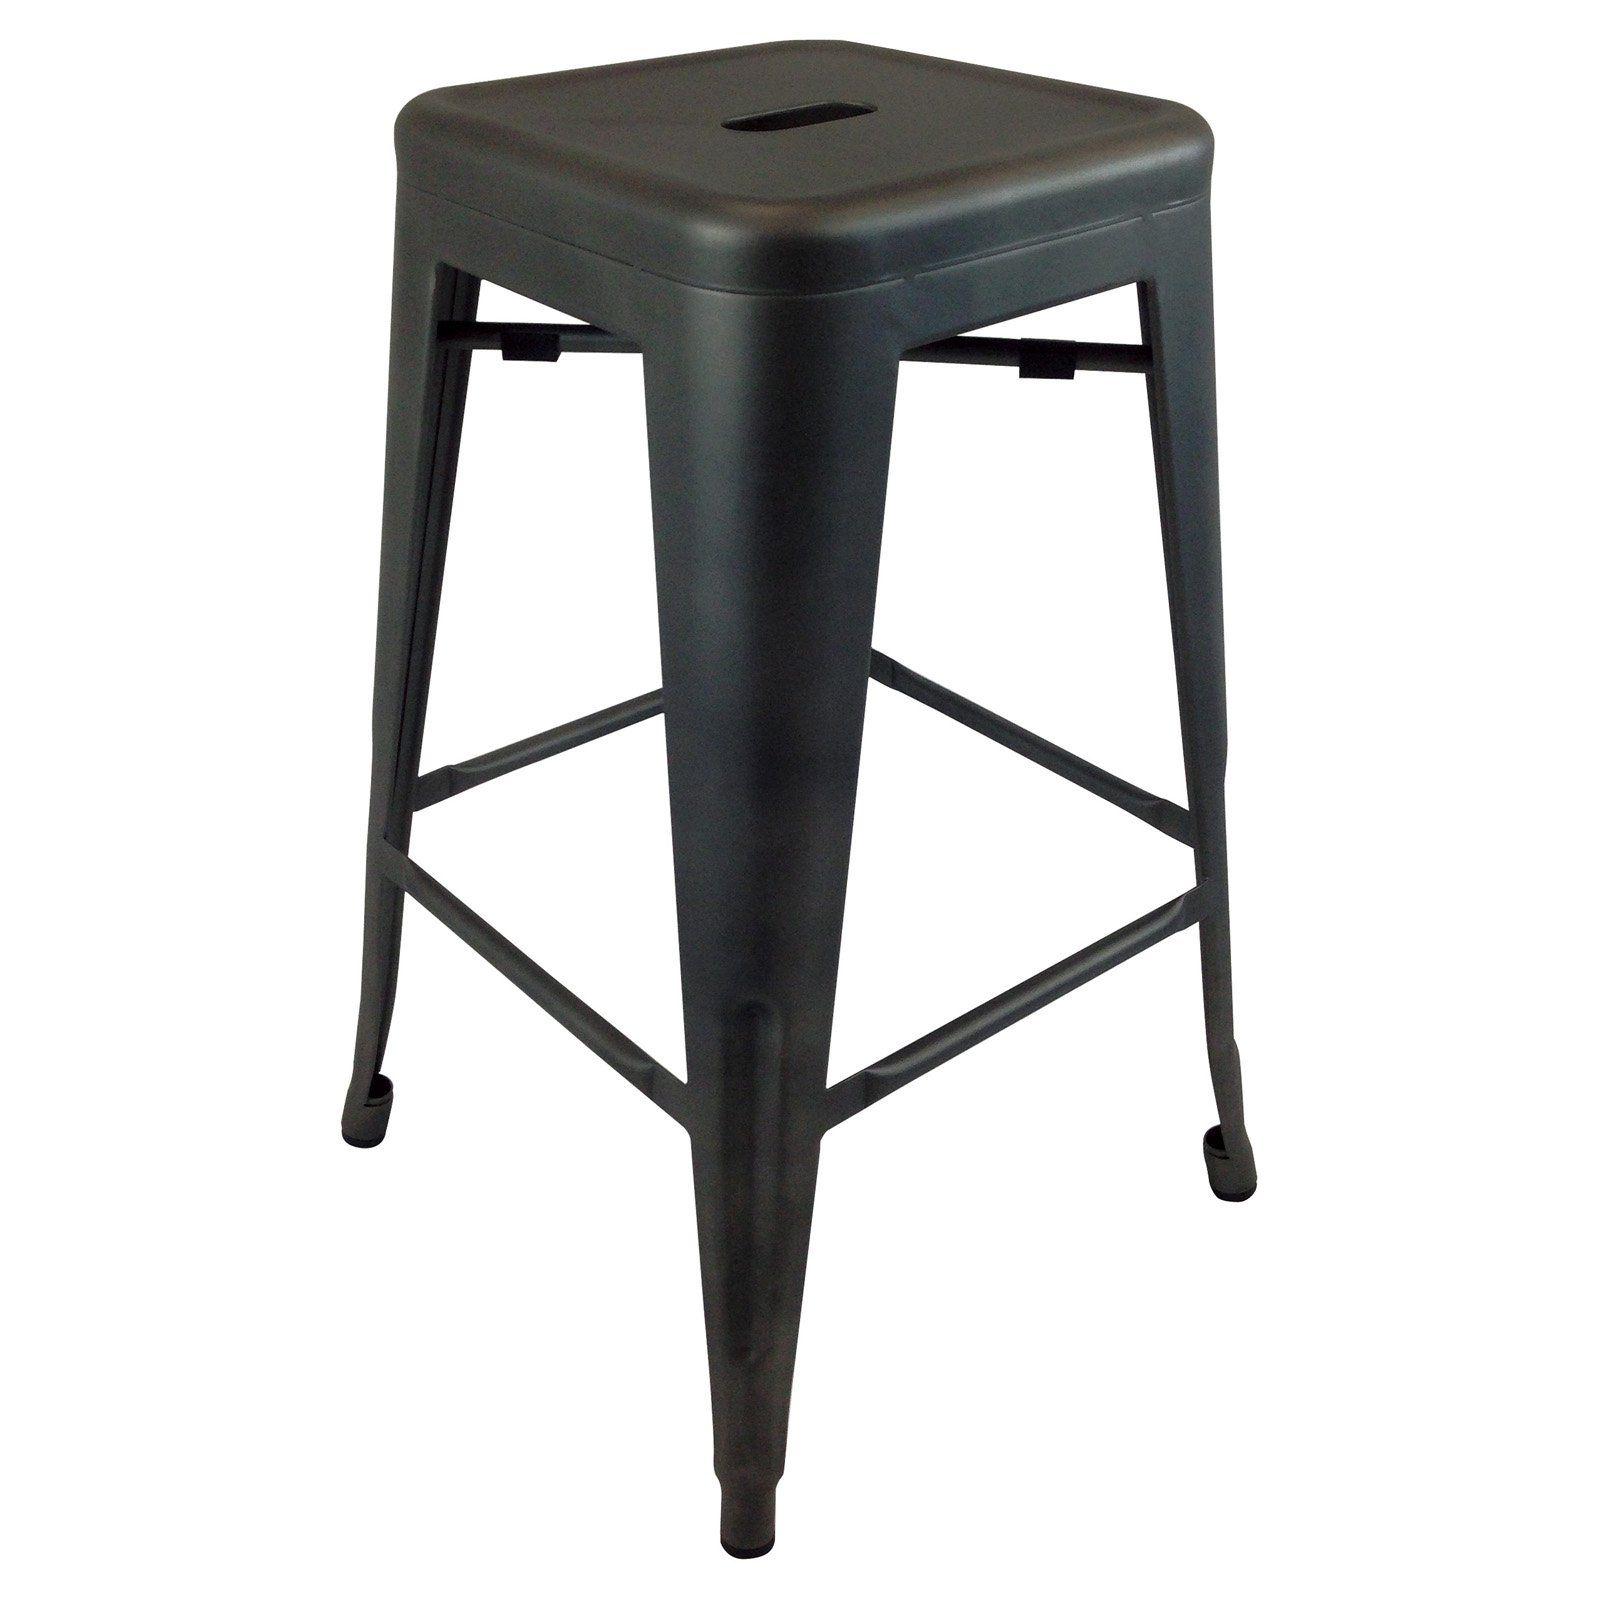 Astonishing Creative Images Quinton 30 In Bar Height Stool Set Of 4 Lamtechconsult Wood Chair Design Ideas Lamtechconsultcom